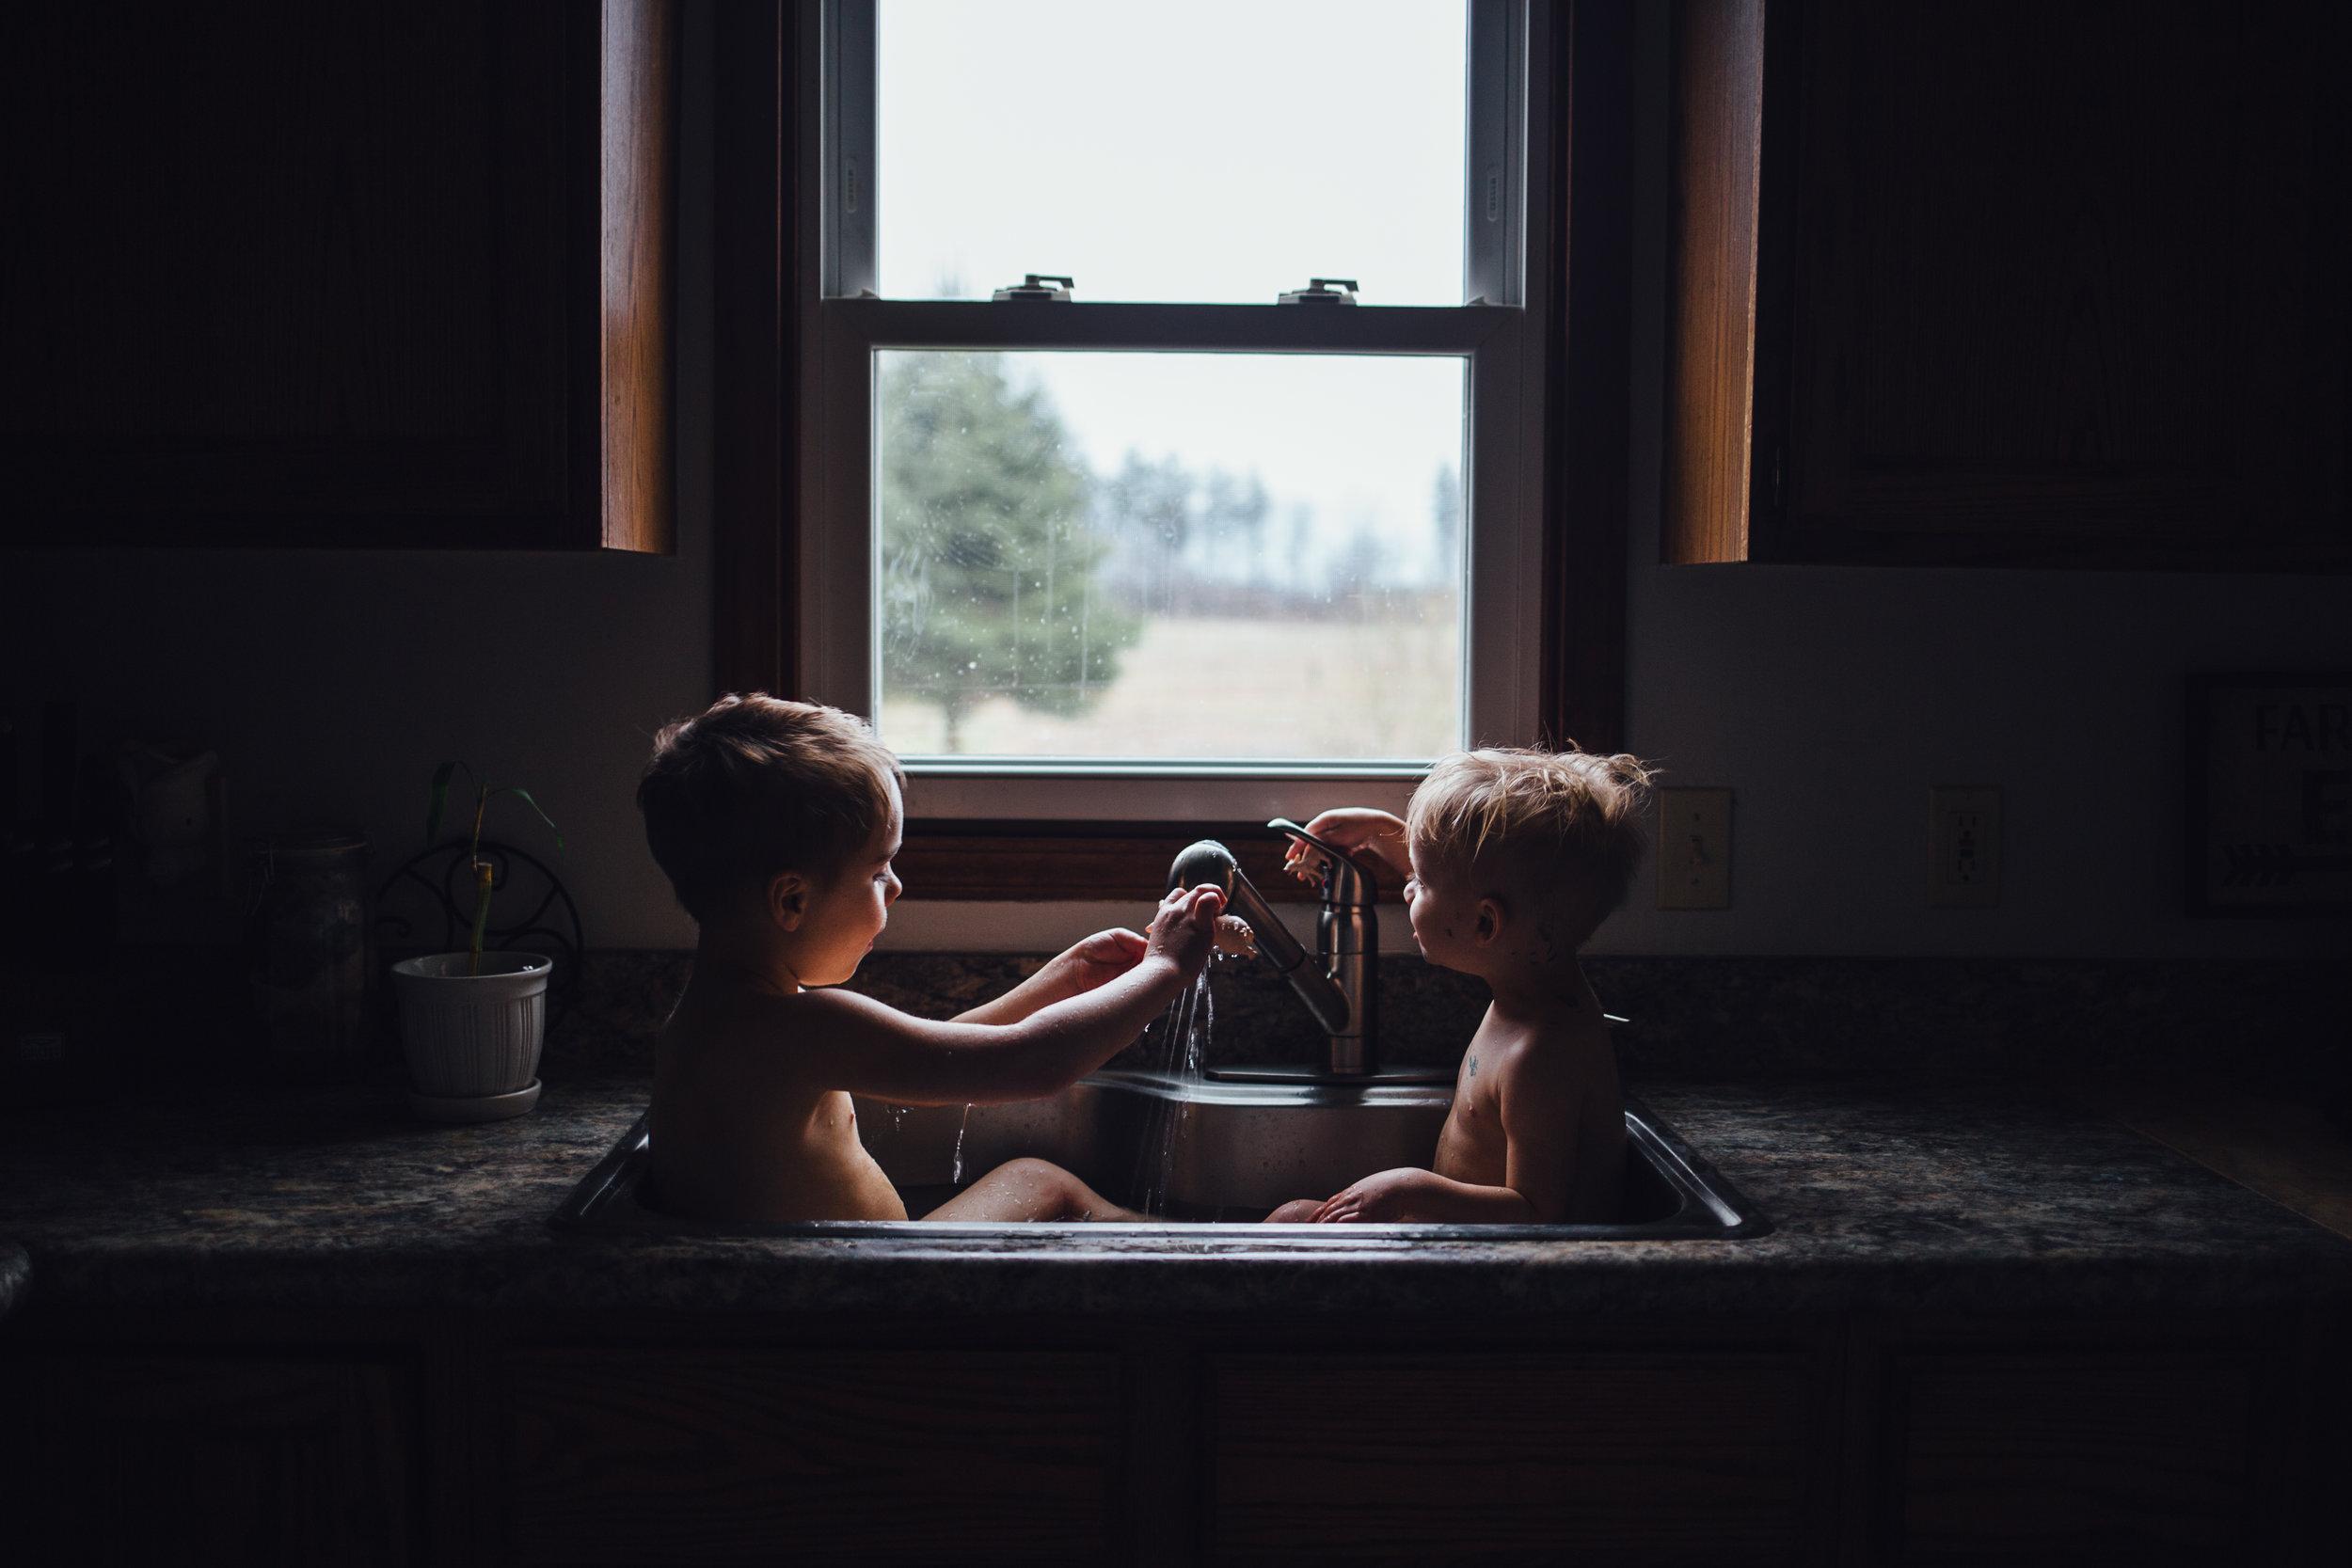 boys in sink bath near kalamazoo michigan